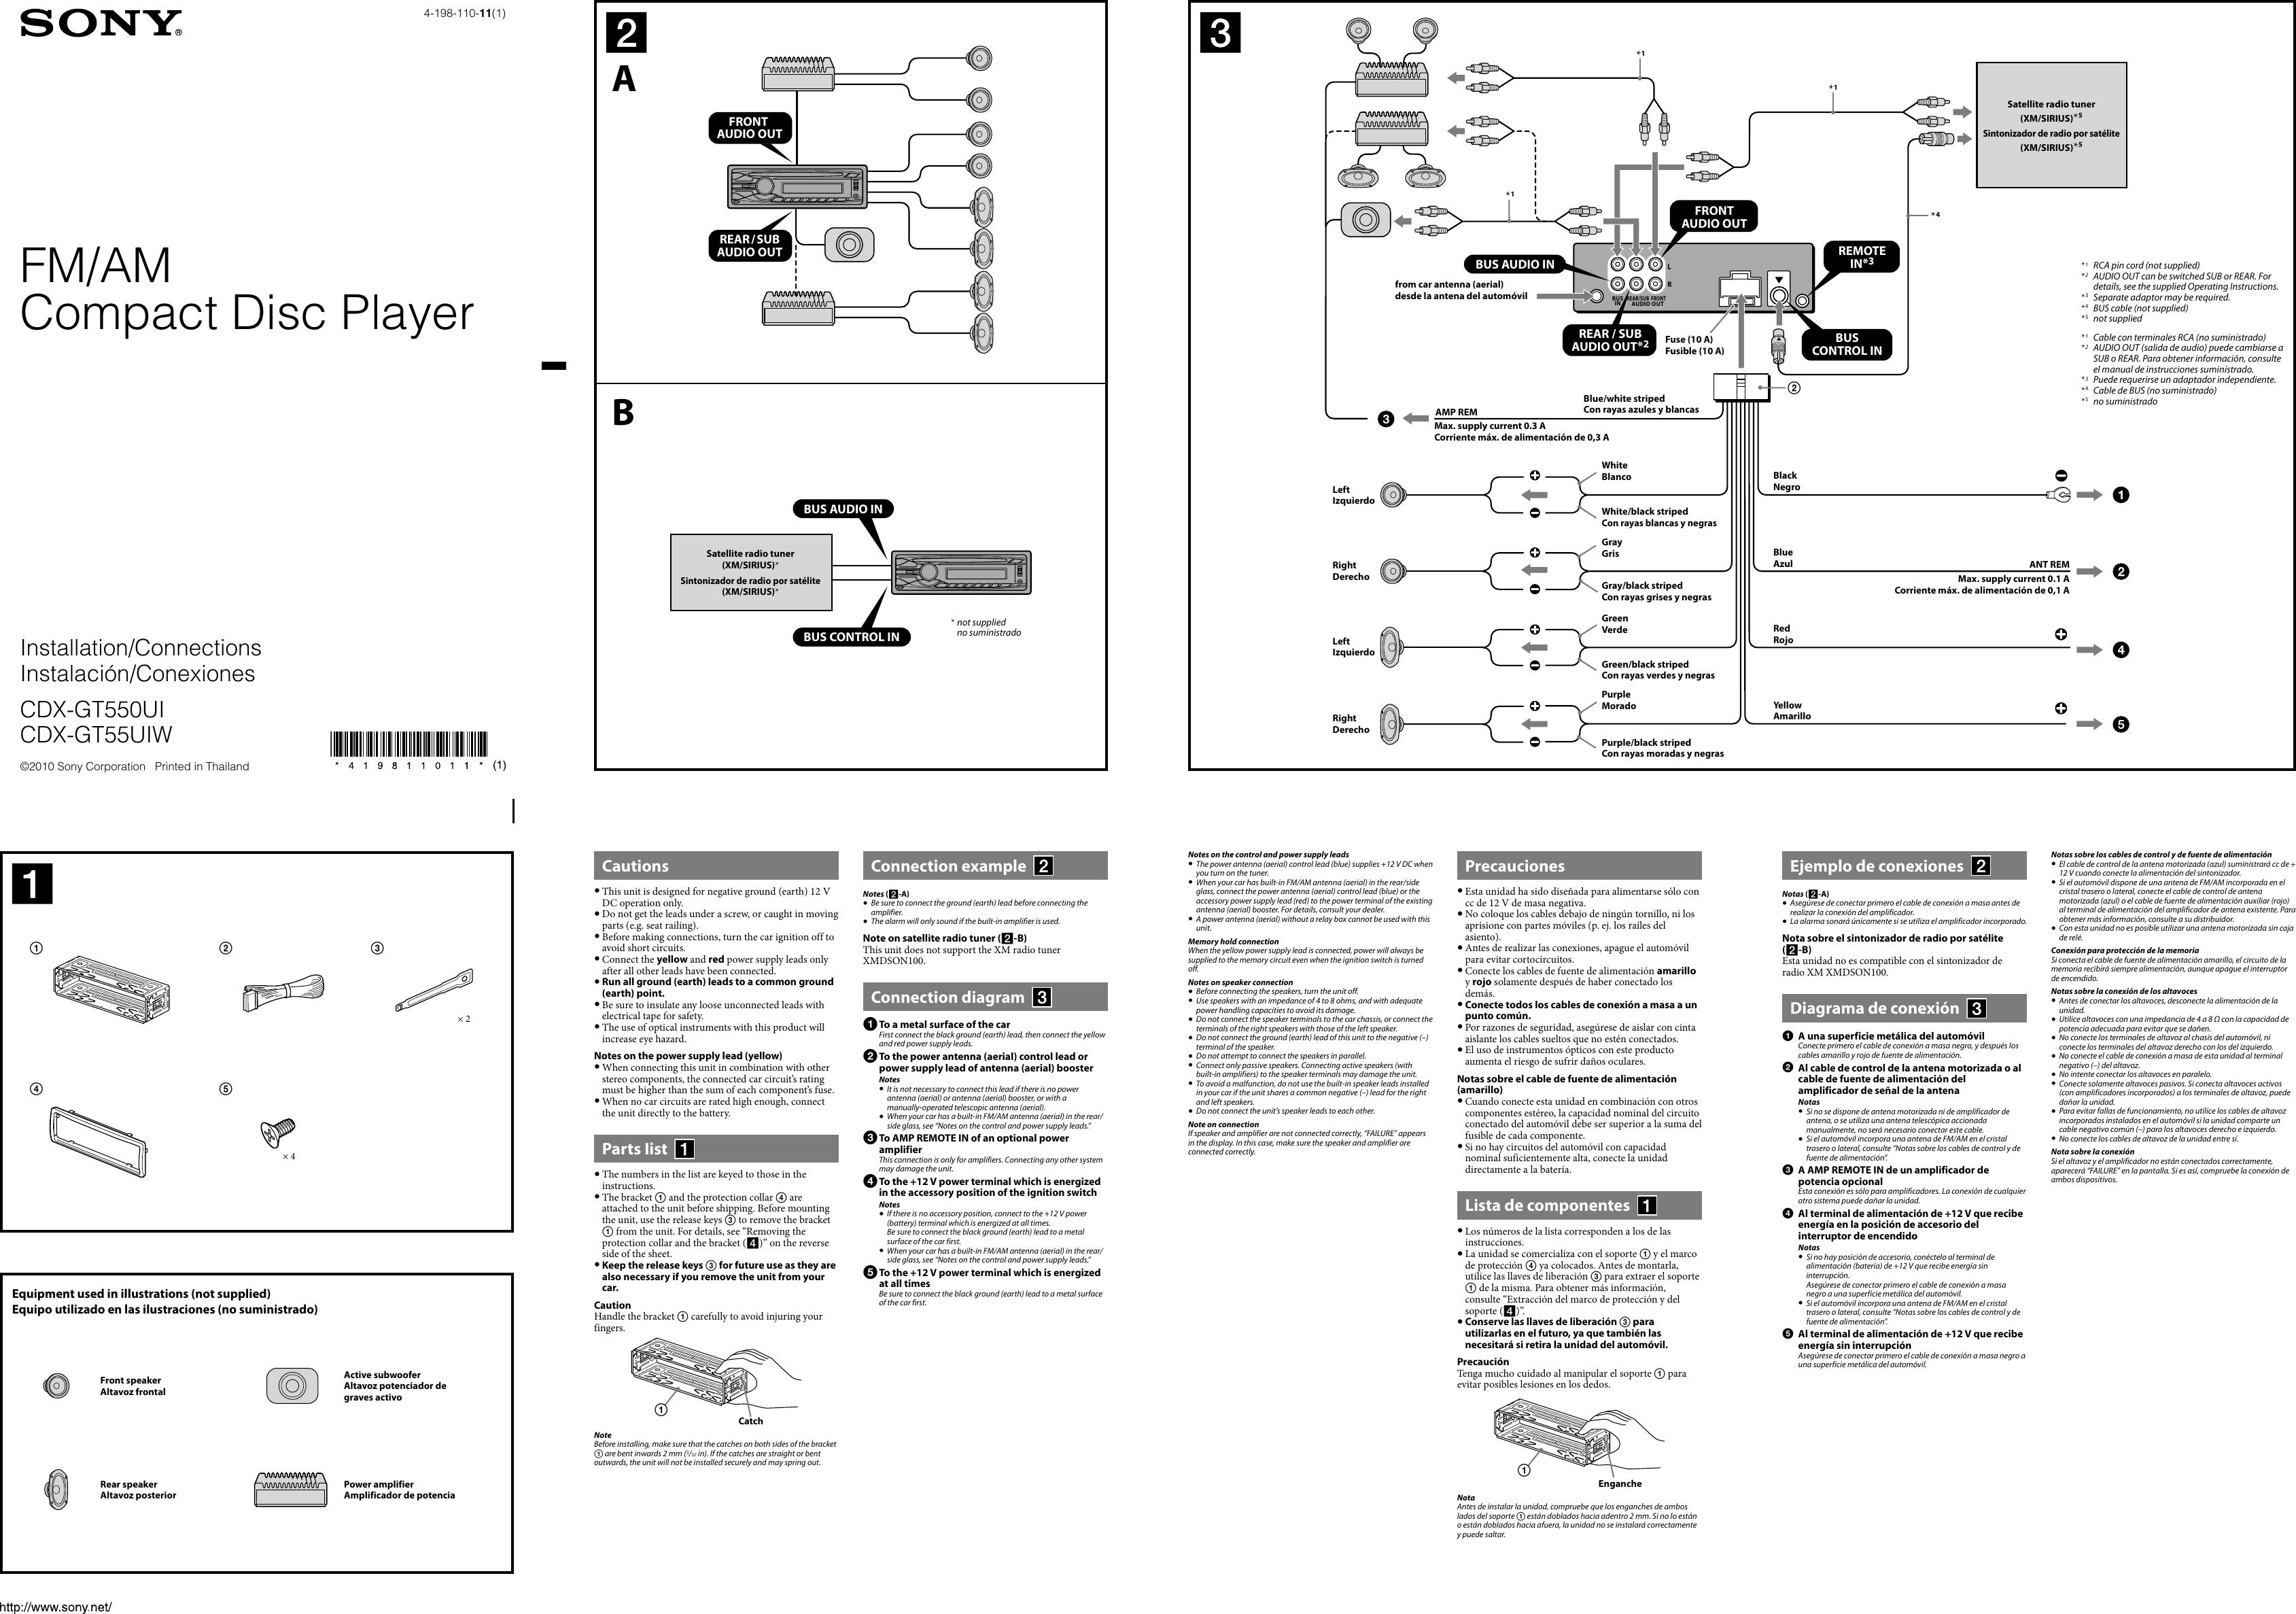 DIAGRAM] Sony Cdx Gt540ui Wiring Diagram FULL Version HD Quality Wiring  Diagram - PREGBOARDWIRING.CONCESSIONARIABELOGISENIGALLIA.ITconcessionariabelogisenigallia.it